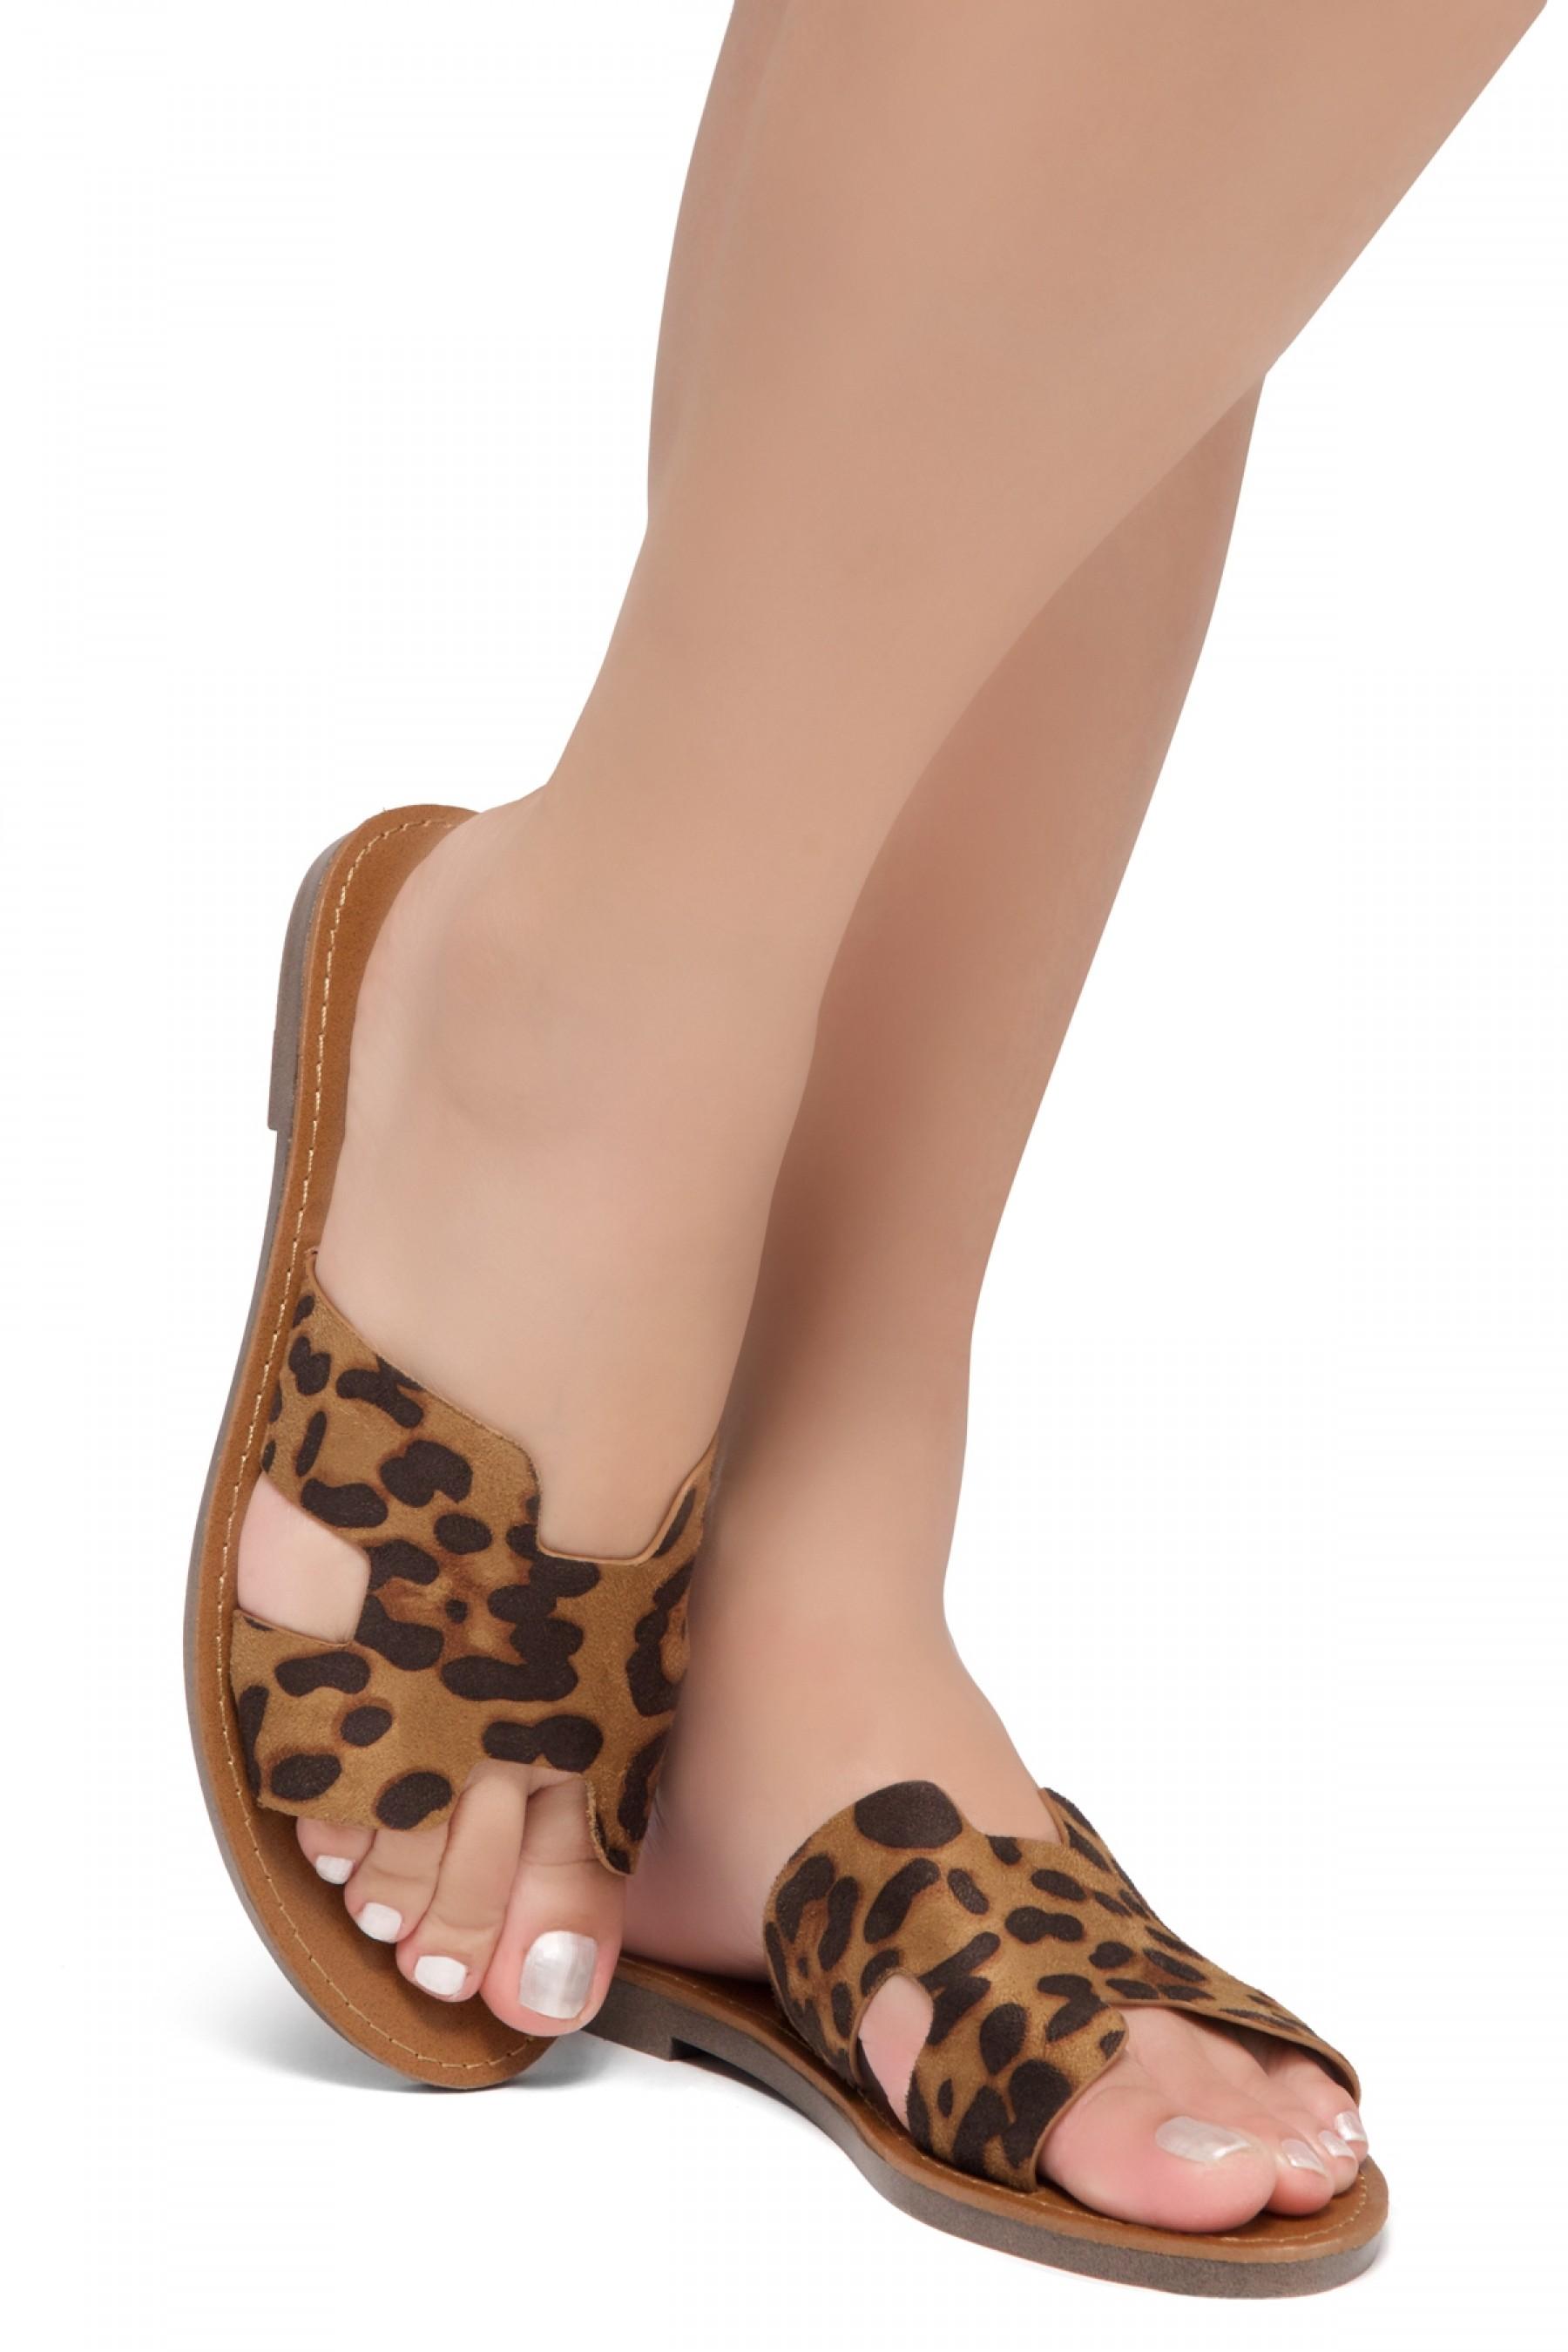 Shoe Land SL-Greece- Lightweight Flat Easy Slide-On Sandals (Leopard)